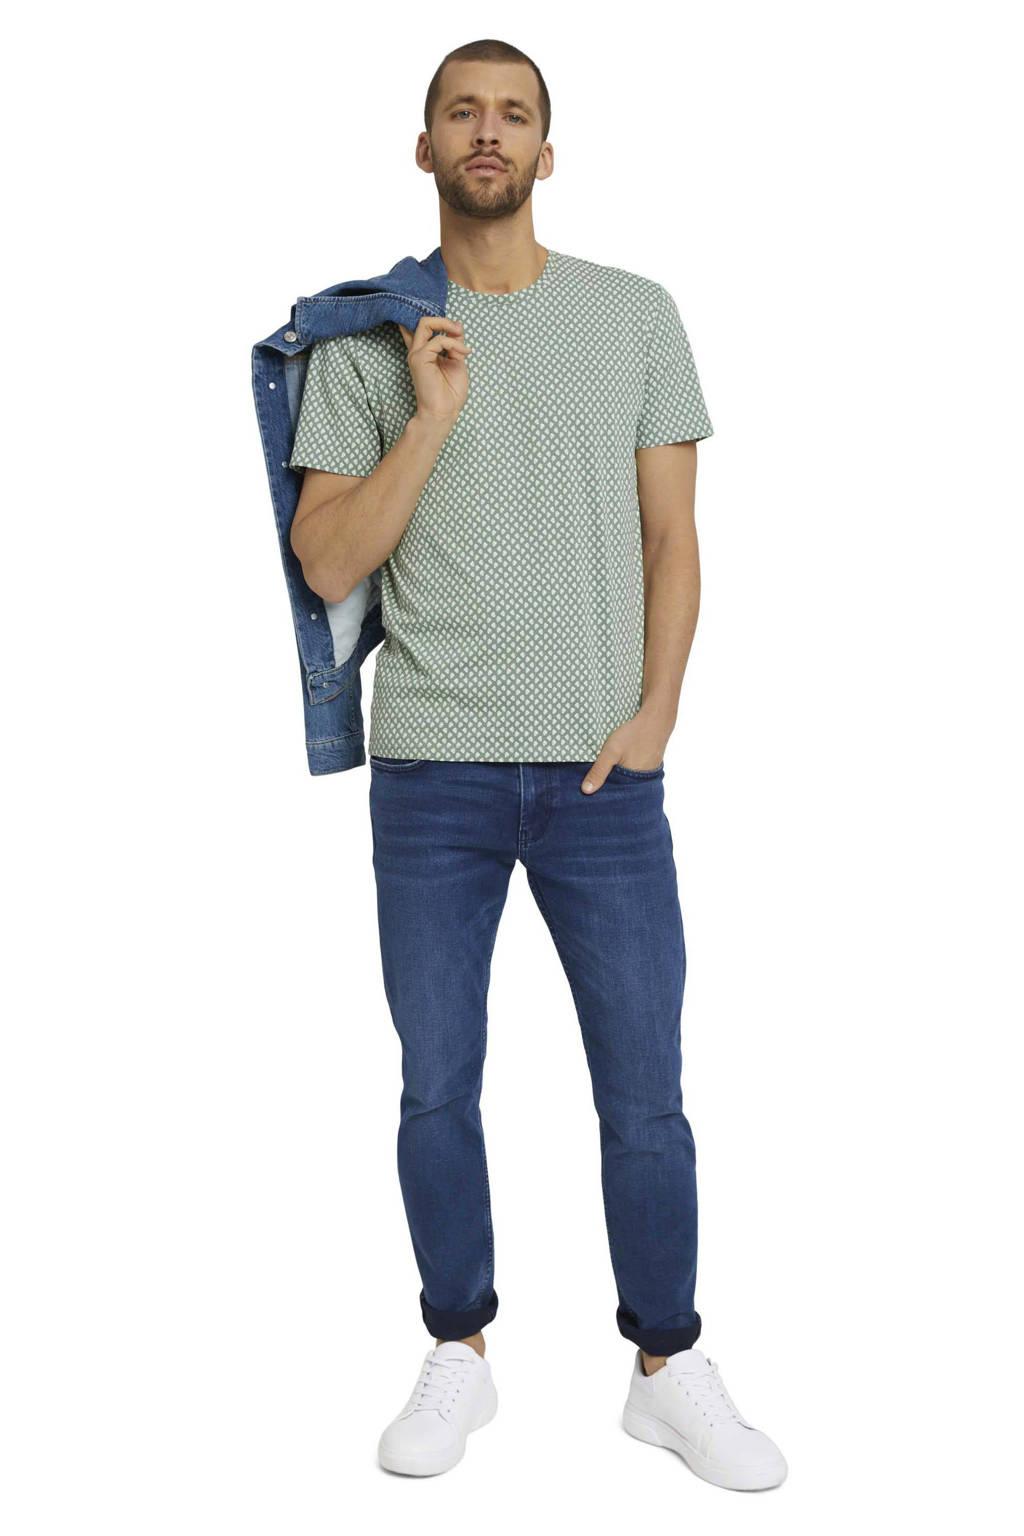 Tom Tailor T-shirt met all over print lichtgroen, Lichtgroen